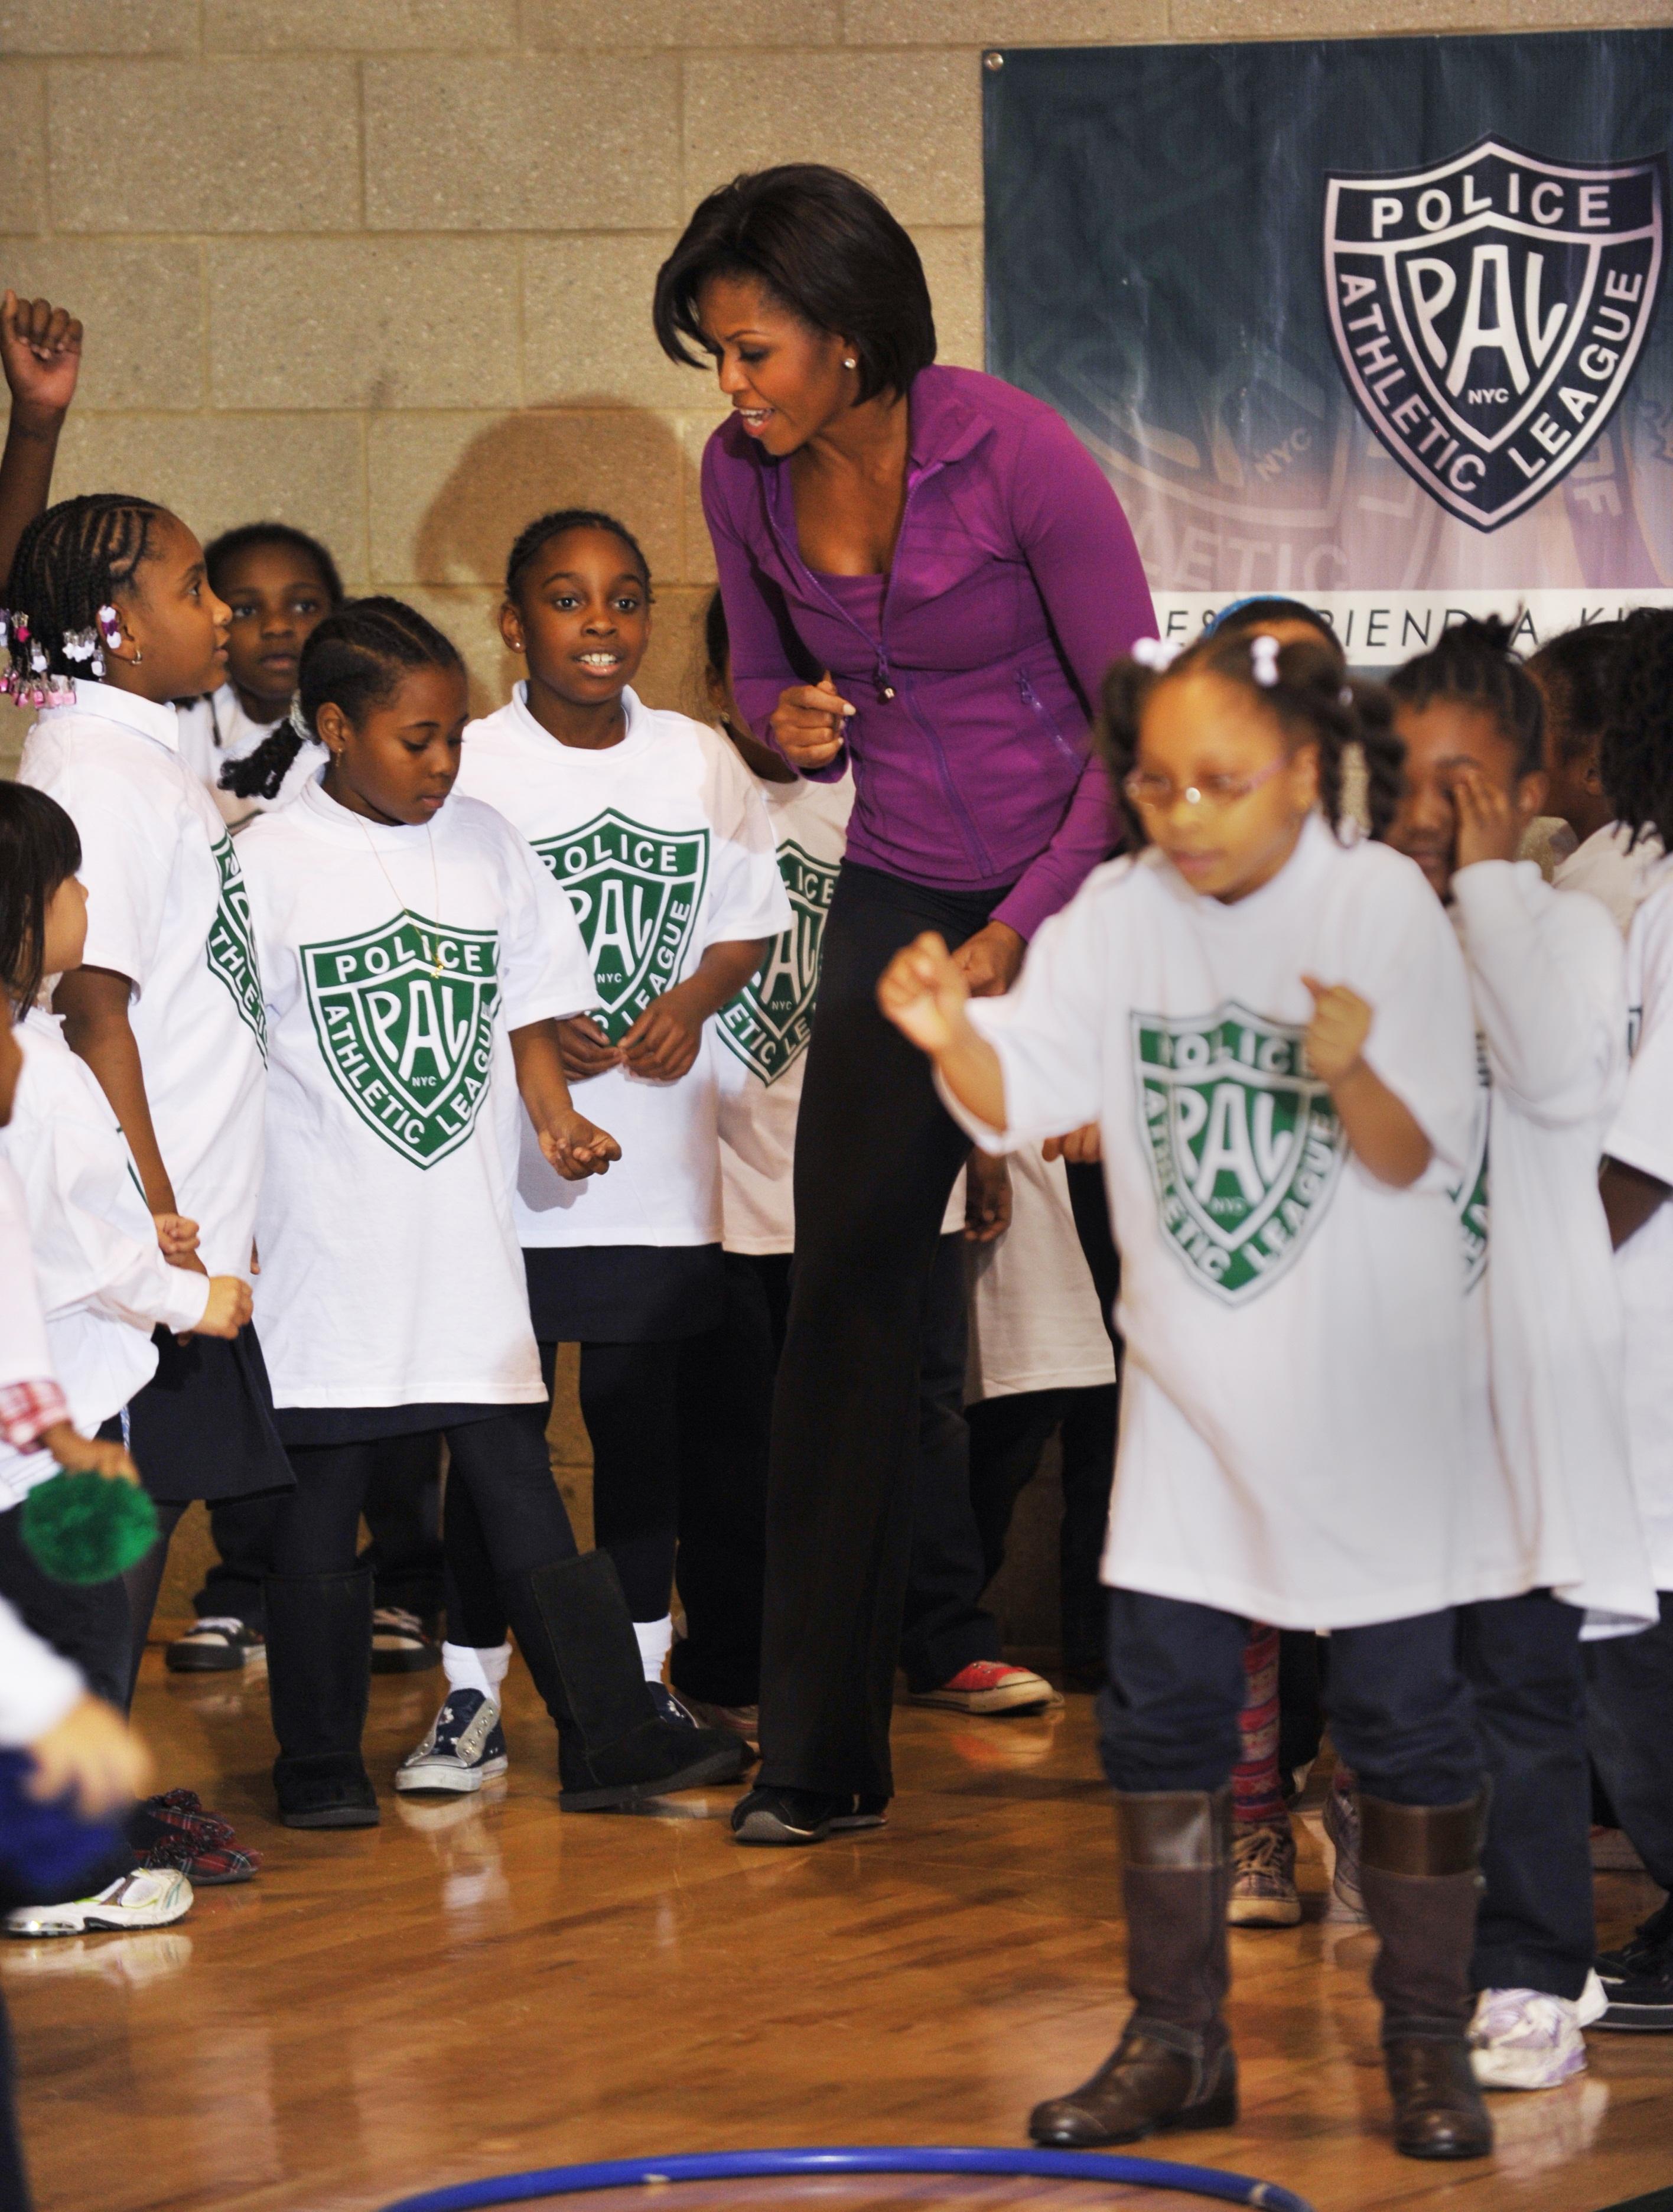 US First Lady Michelle Obama (C) dances